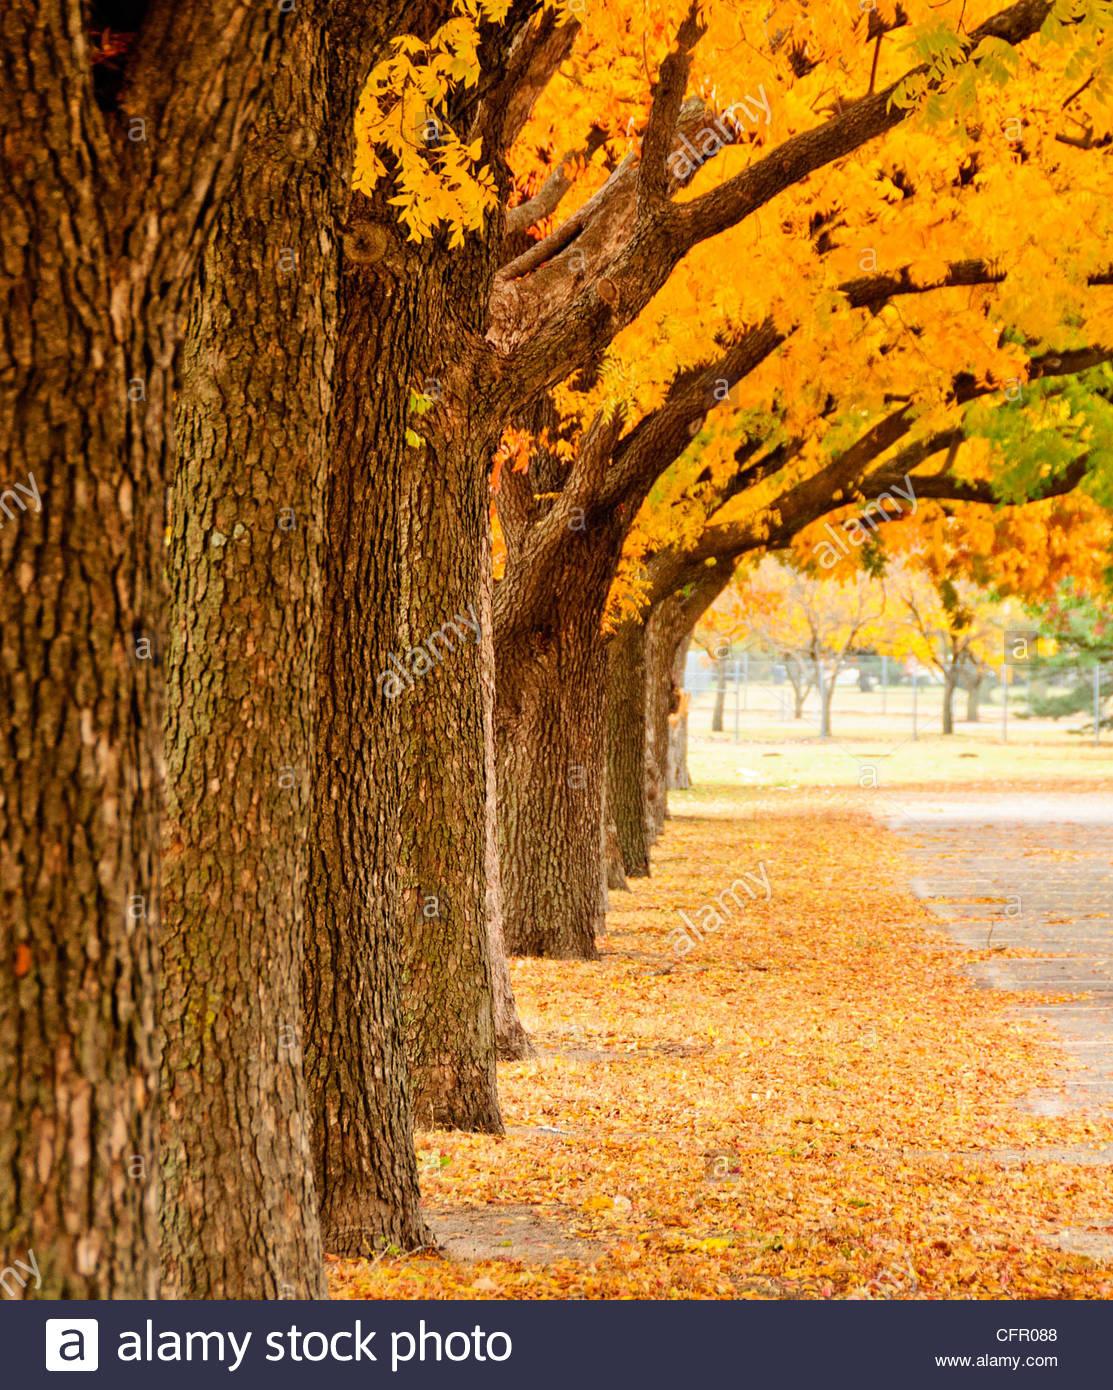 Autumn Colors at Watson Park, Wichita, KS, Nov 14, 2010 - Stock Image